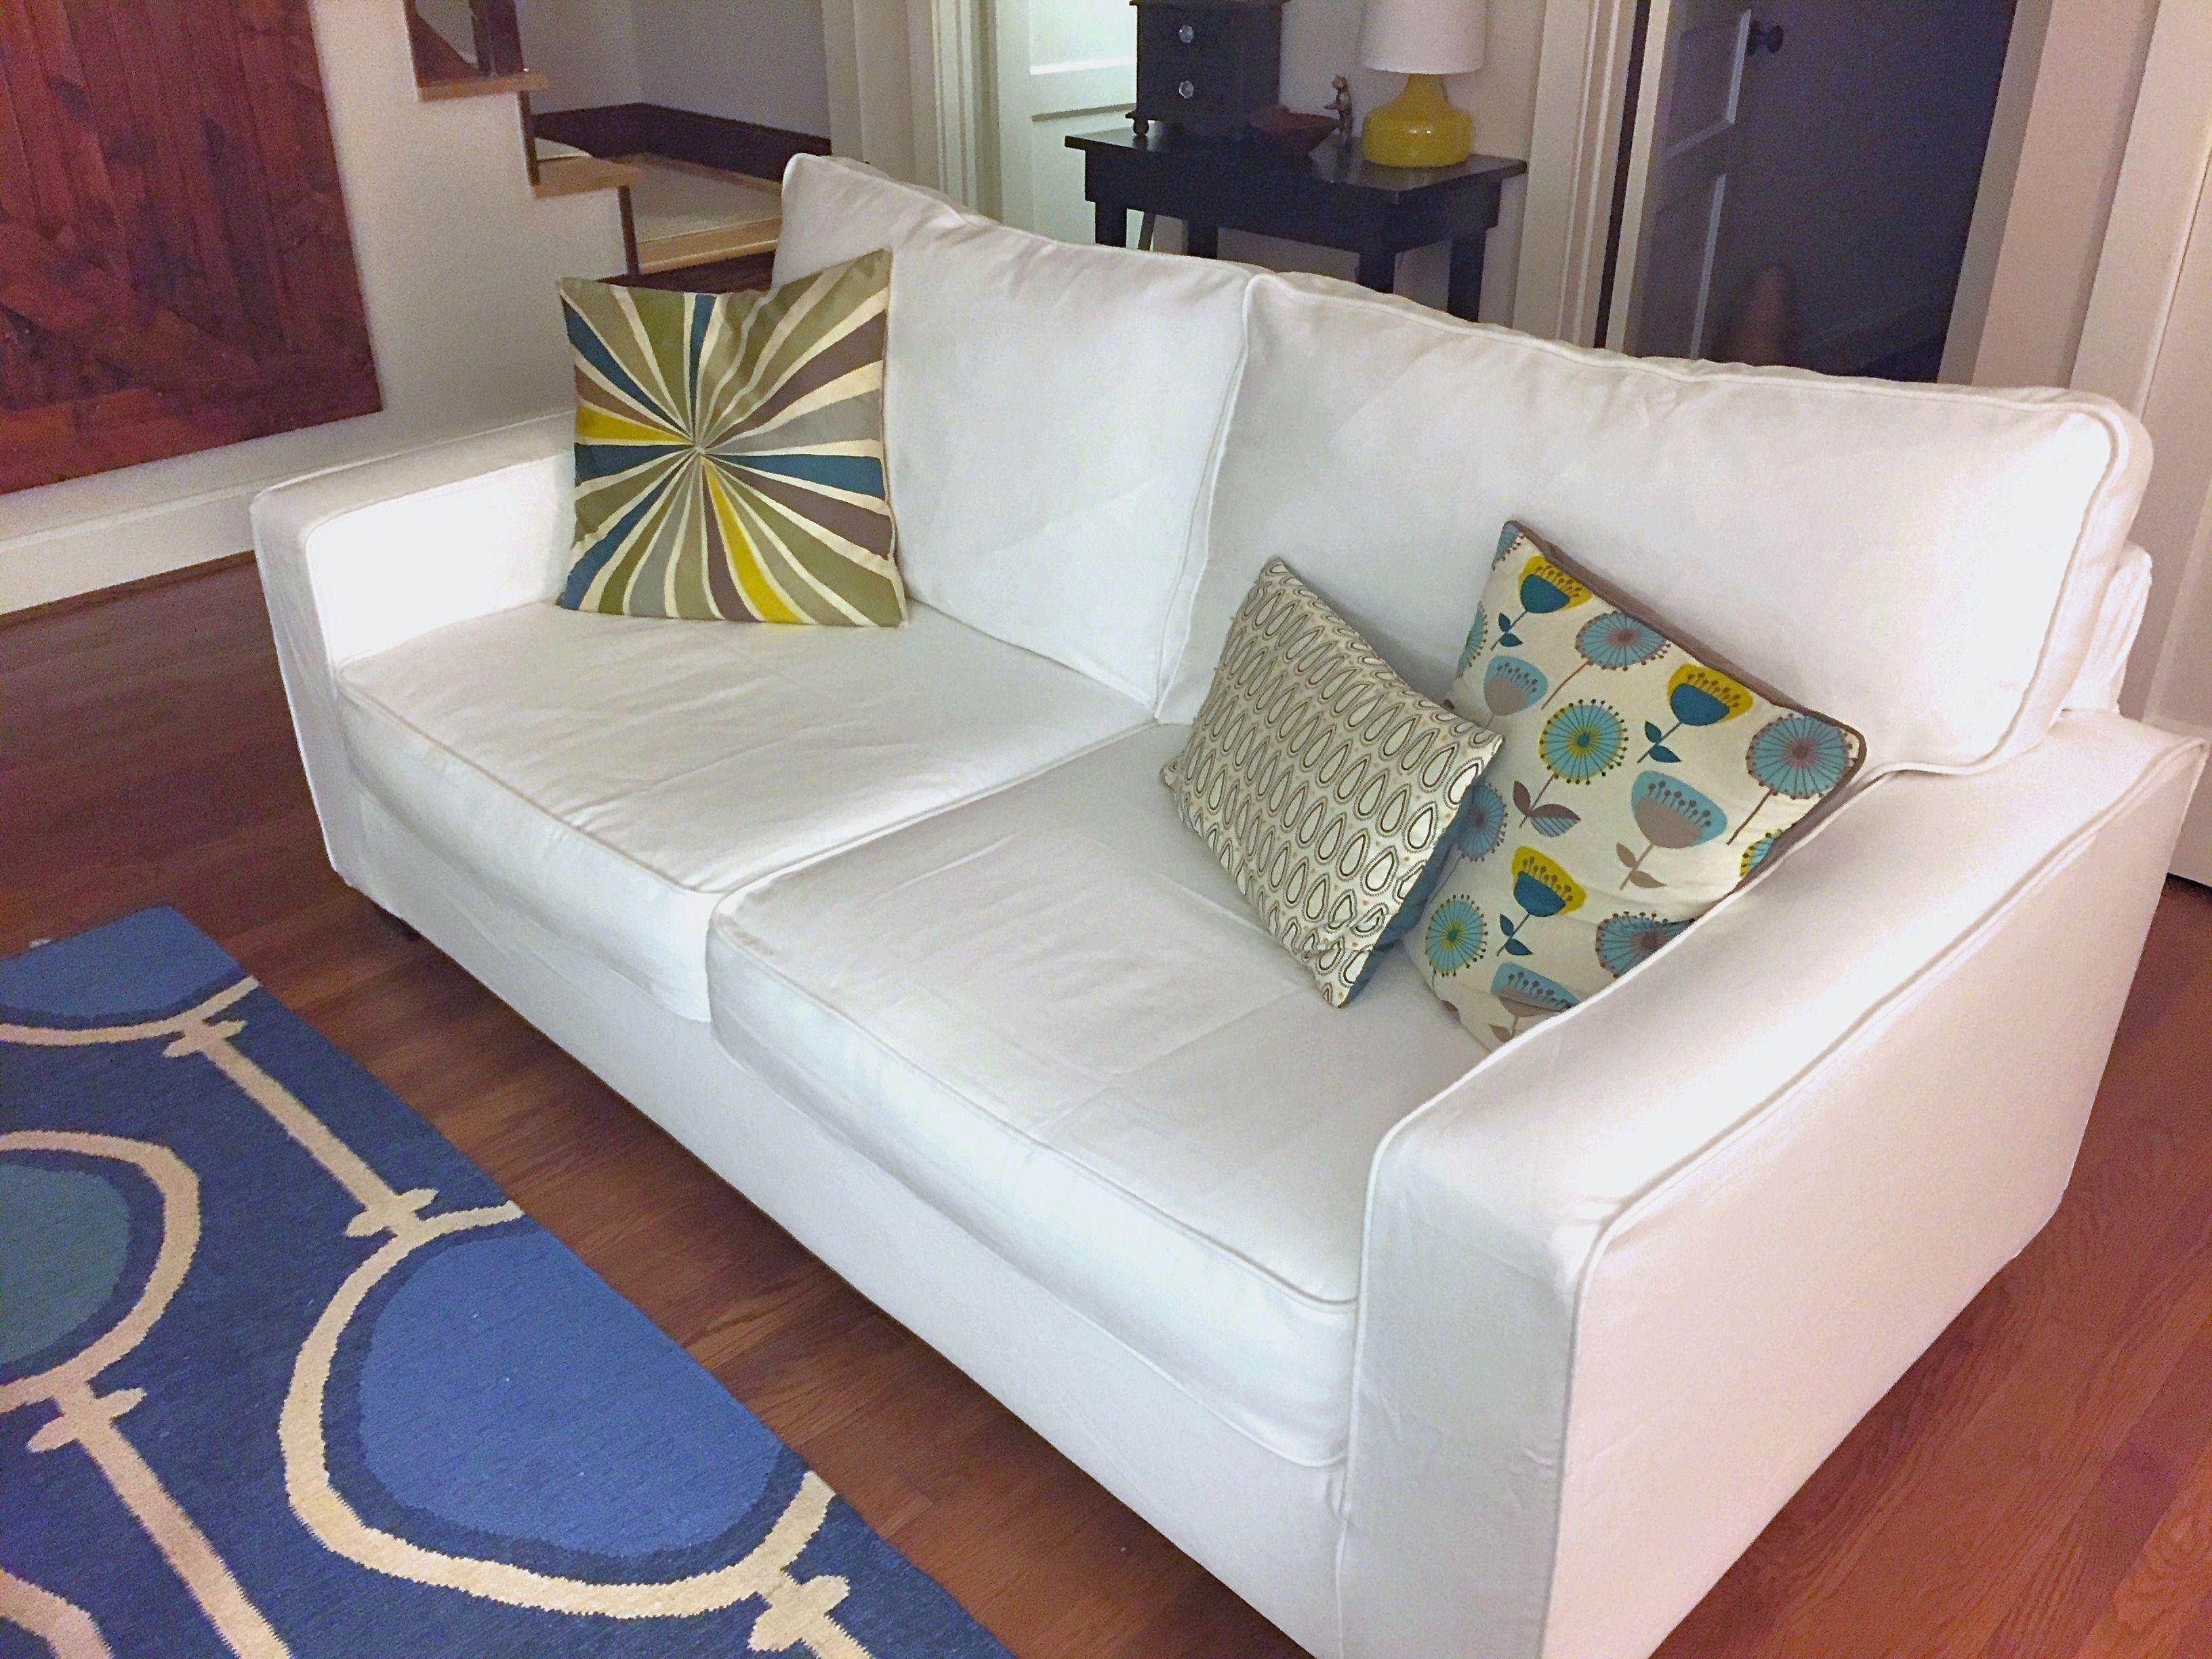 Pleasing Pottery Barn Comfort Square Arm Sofa In Gaia White Crisp Beatyapartments Chair Design Images Beatyapartmentscom